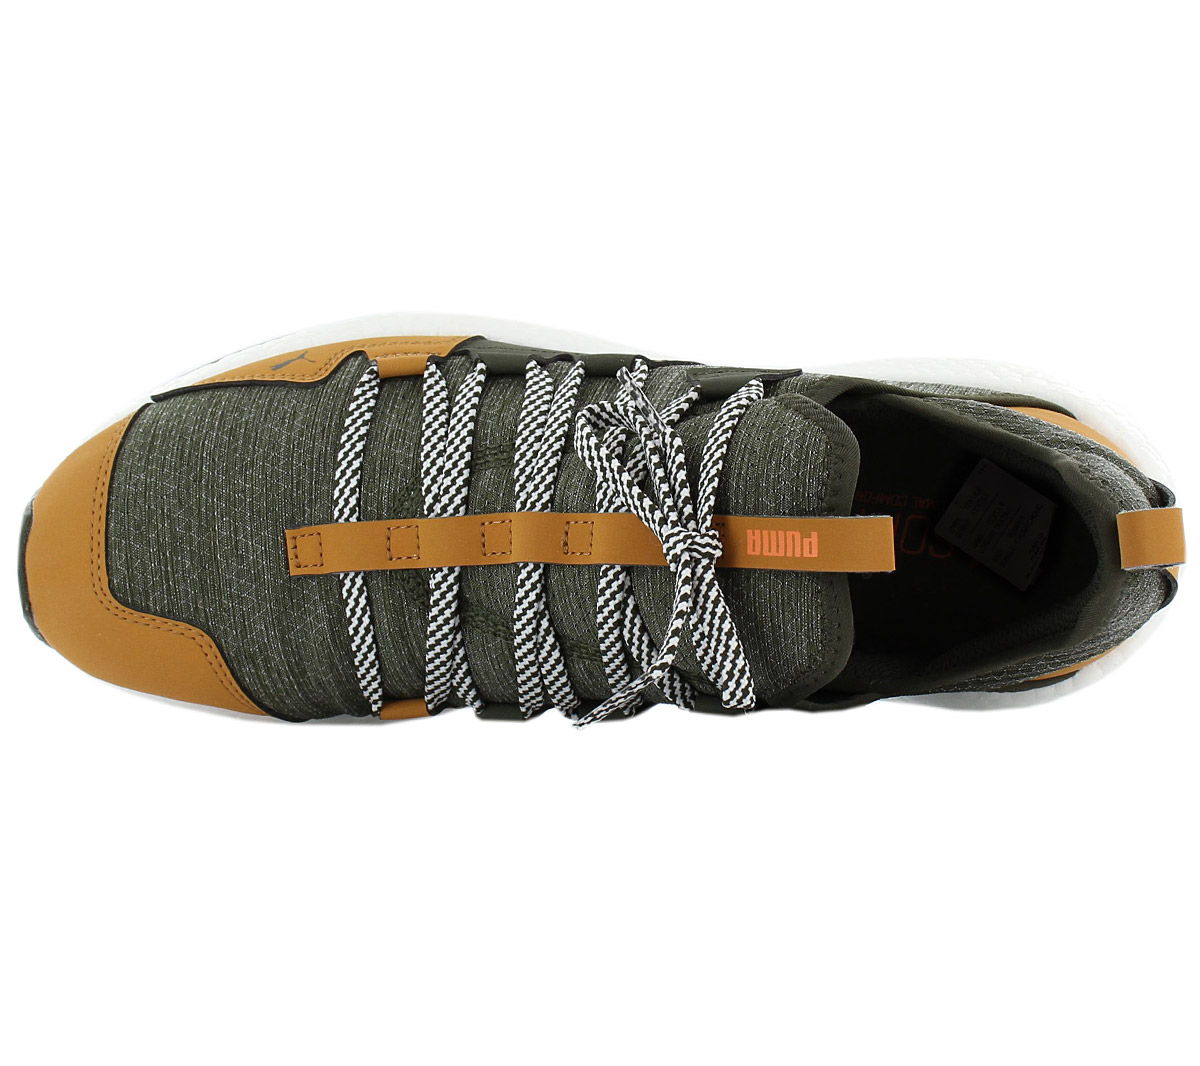 82d0ec2ebd9f Puma Mega Nrgy Trail Shoes Men s Sneakers Trainers 191201-01 Sports ...